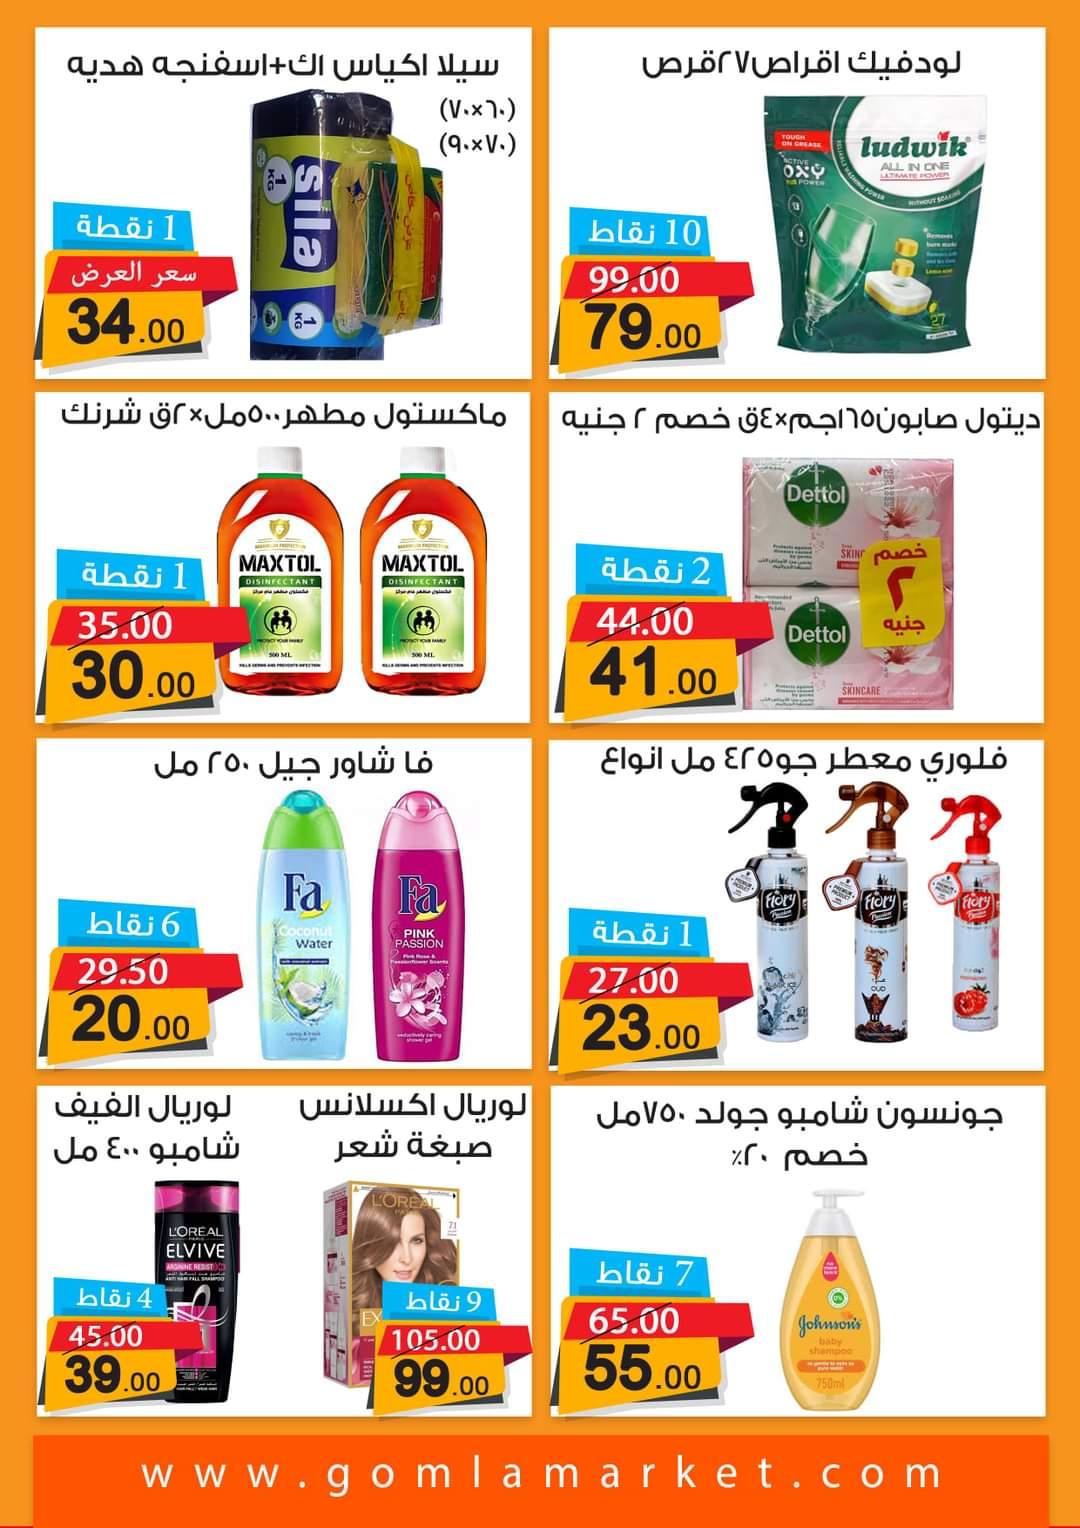 Detergent section discounts